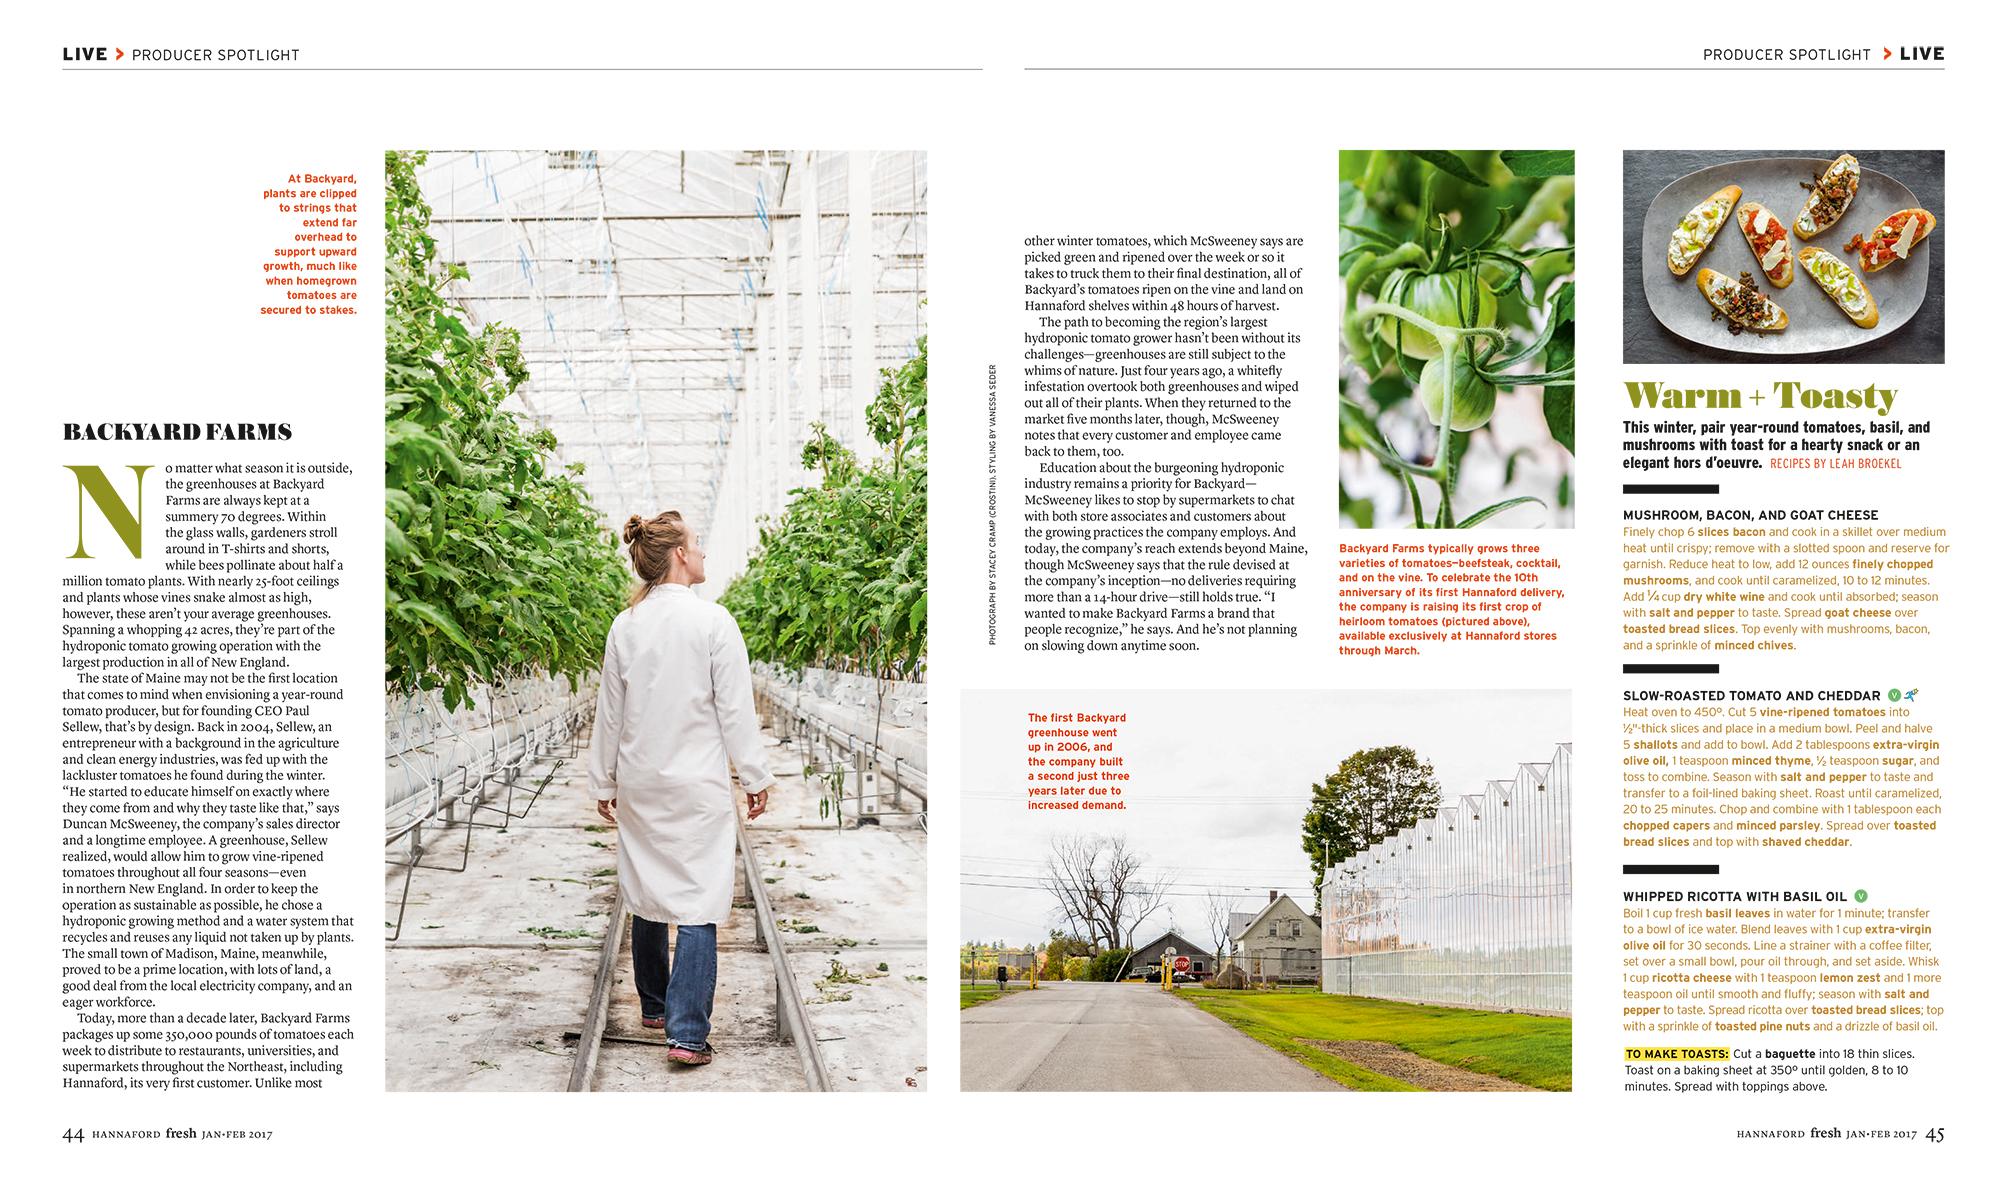 GretaFresh-Greenhouses-3-SM.jpg